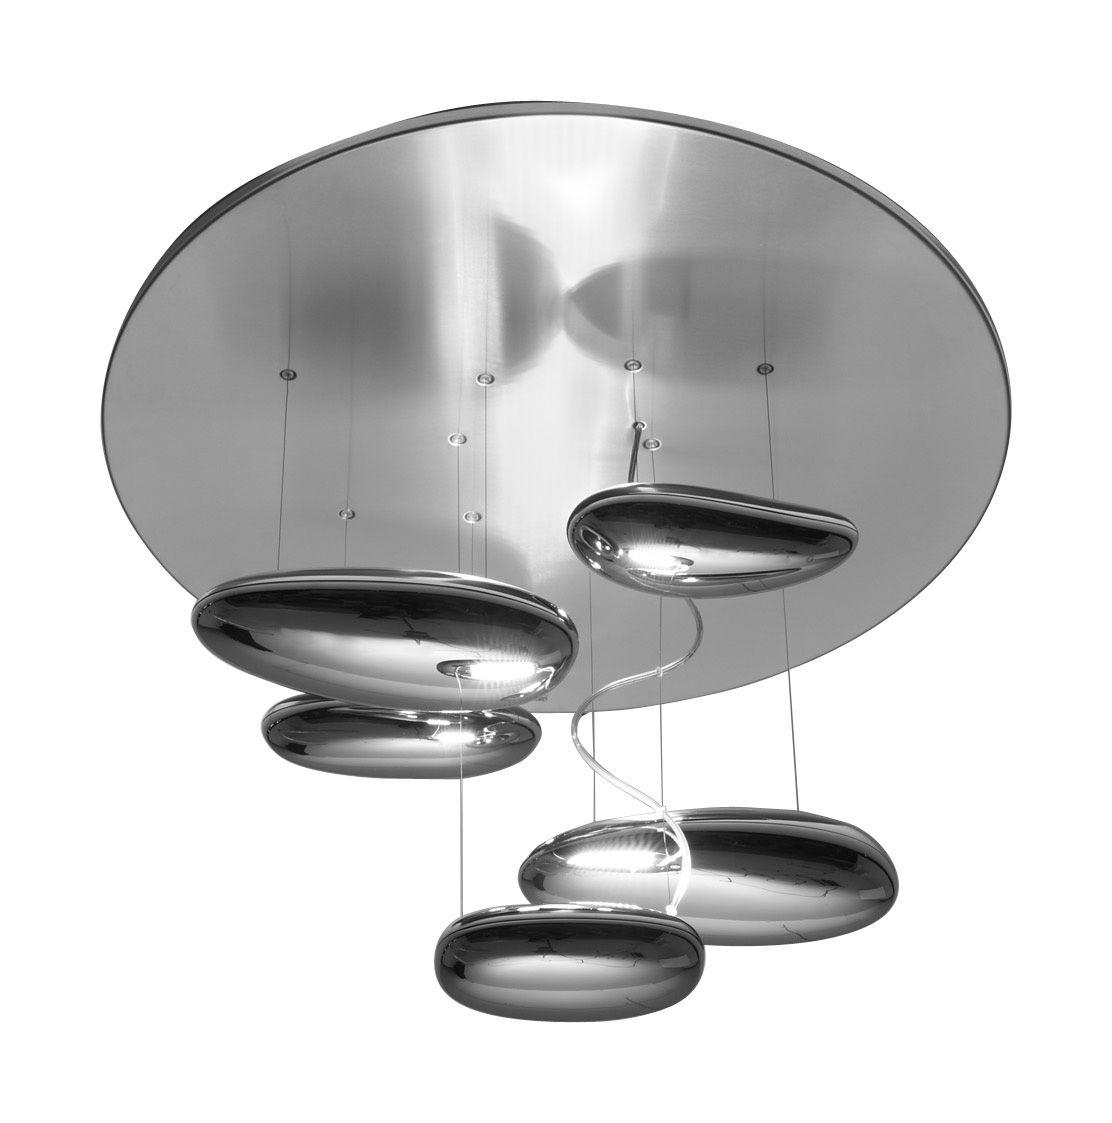 Luminaire - Plafonniers - Plafonnier Mercury mini / Halogène - Ø 70 cm - Artemide - Gris métal & miroir - Acier inoxydable, Aluminium